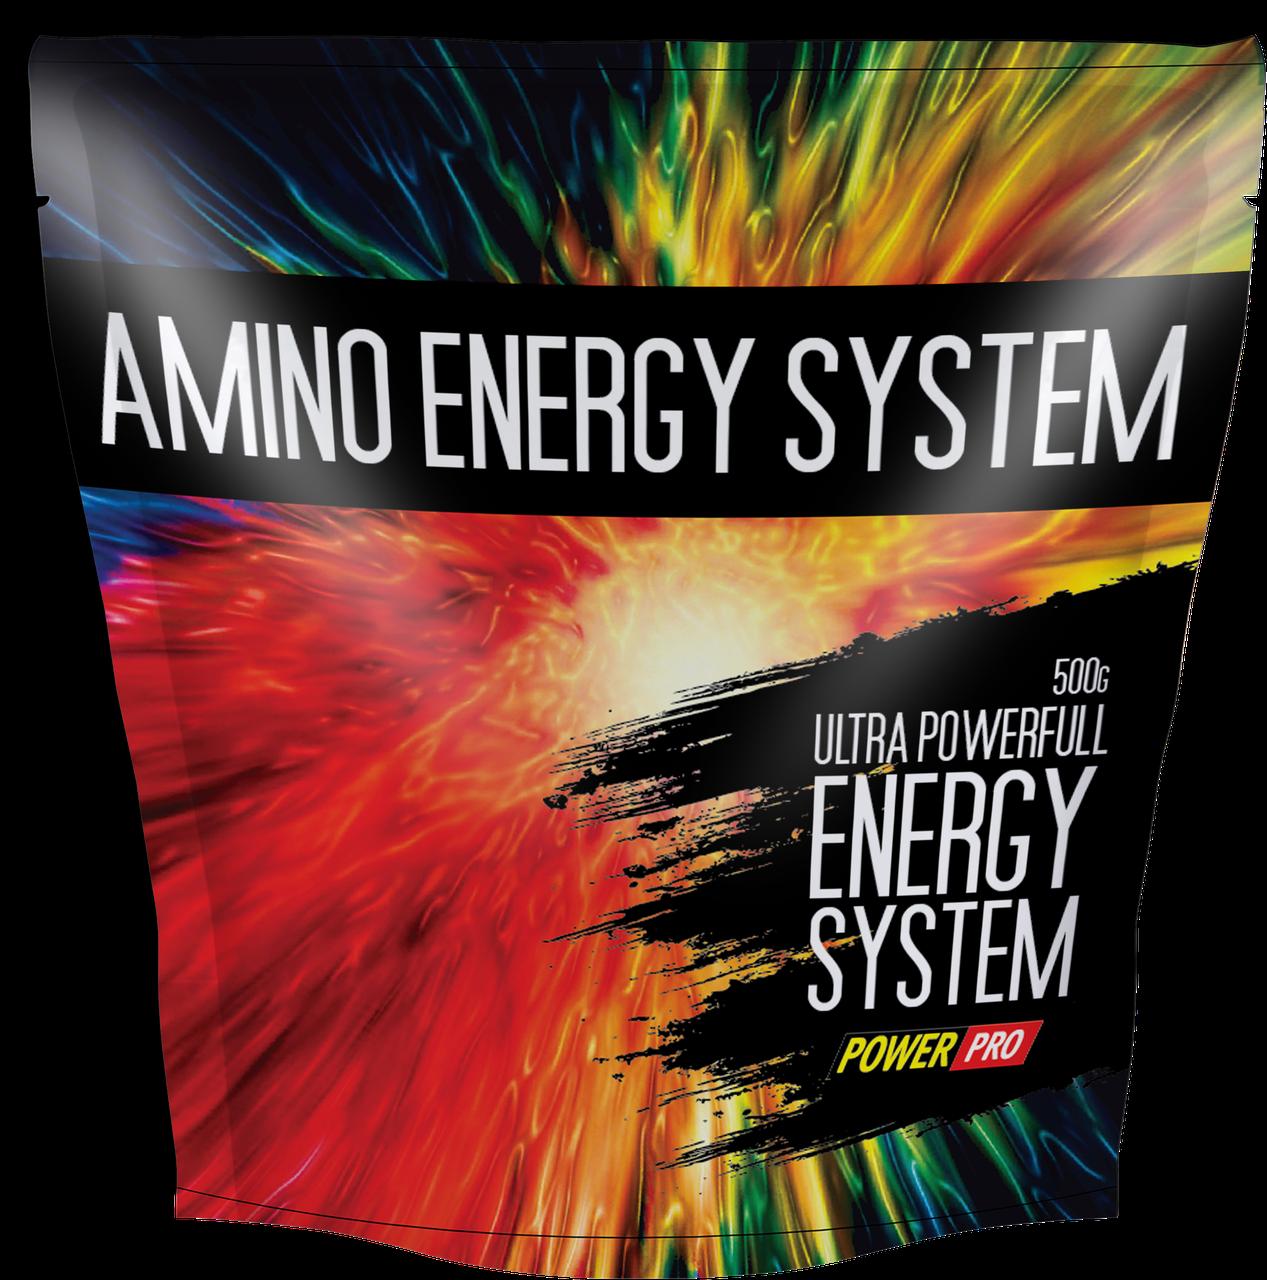 Power Pro AMINO ENERGY SYSTEM 500 g